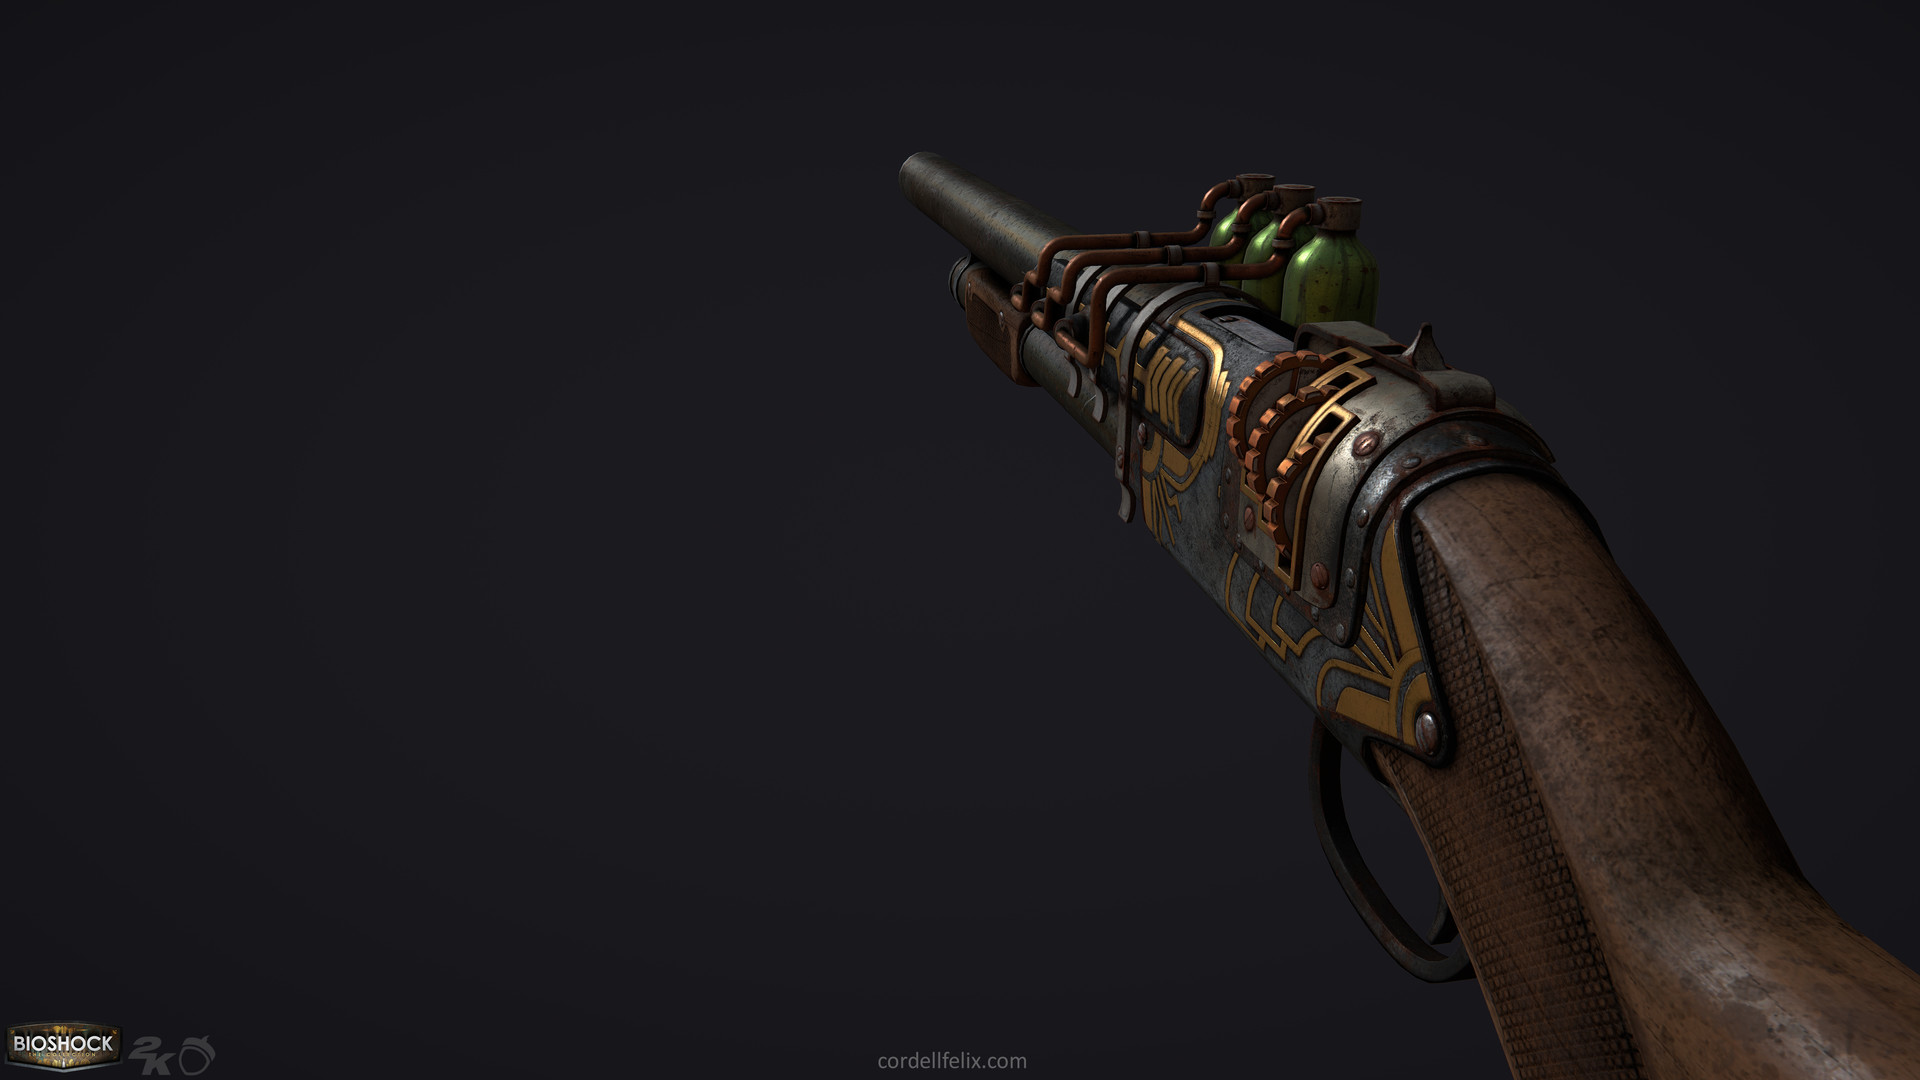 Cordell felix cordellfelix shotgun 09